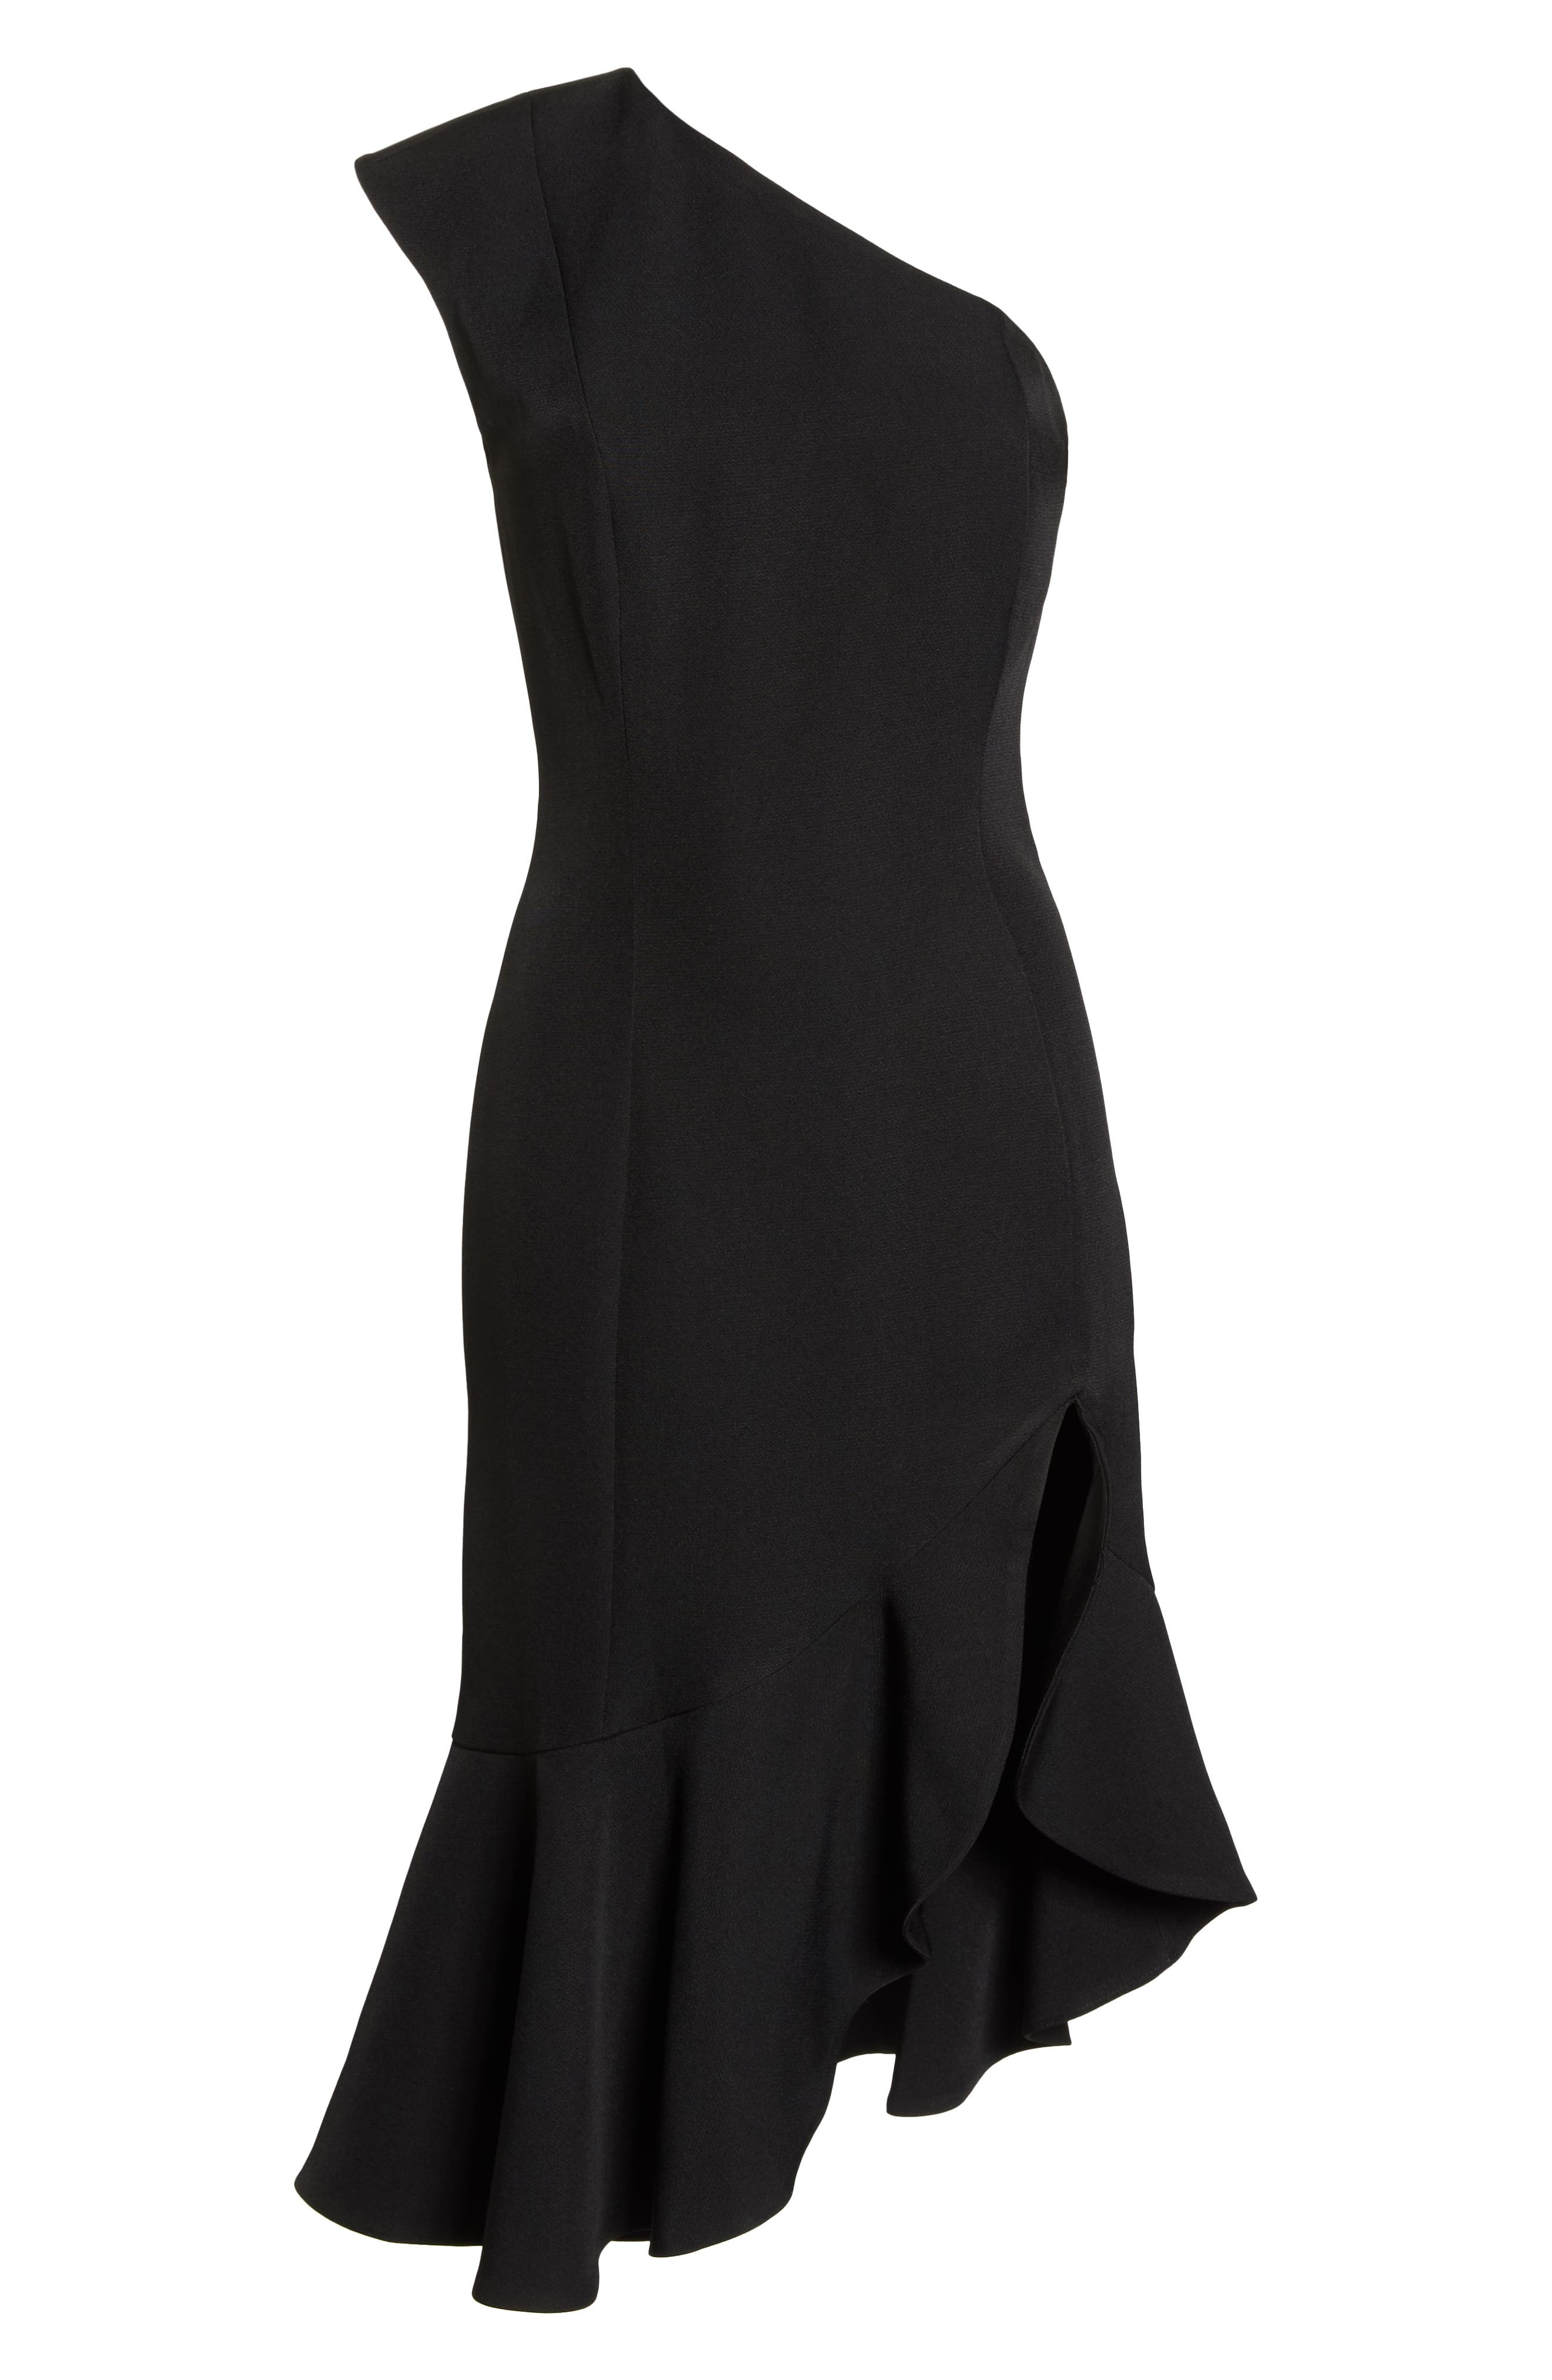 KEEPSAKE THE LABEL,                             Mirrors One-Shoulder Asymmetrical Dress,                             Alternate thumbnail 7, color,                             001